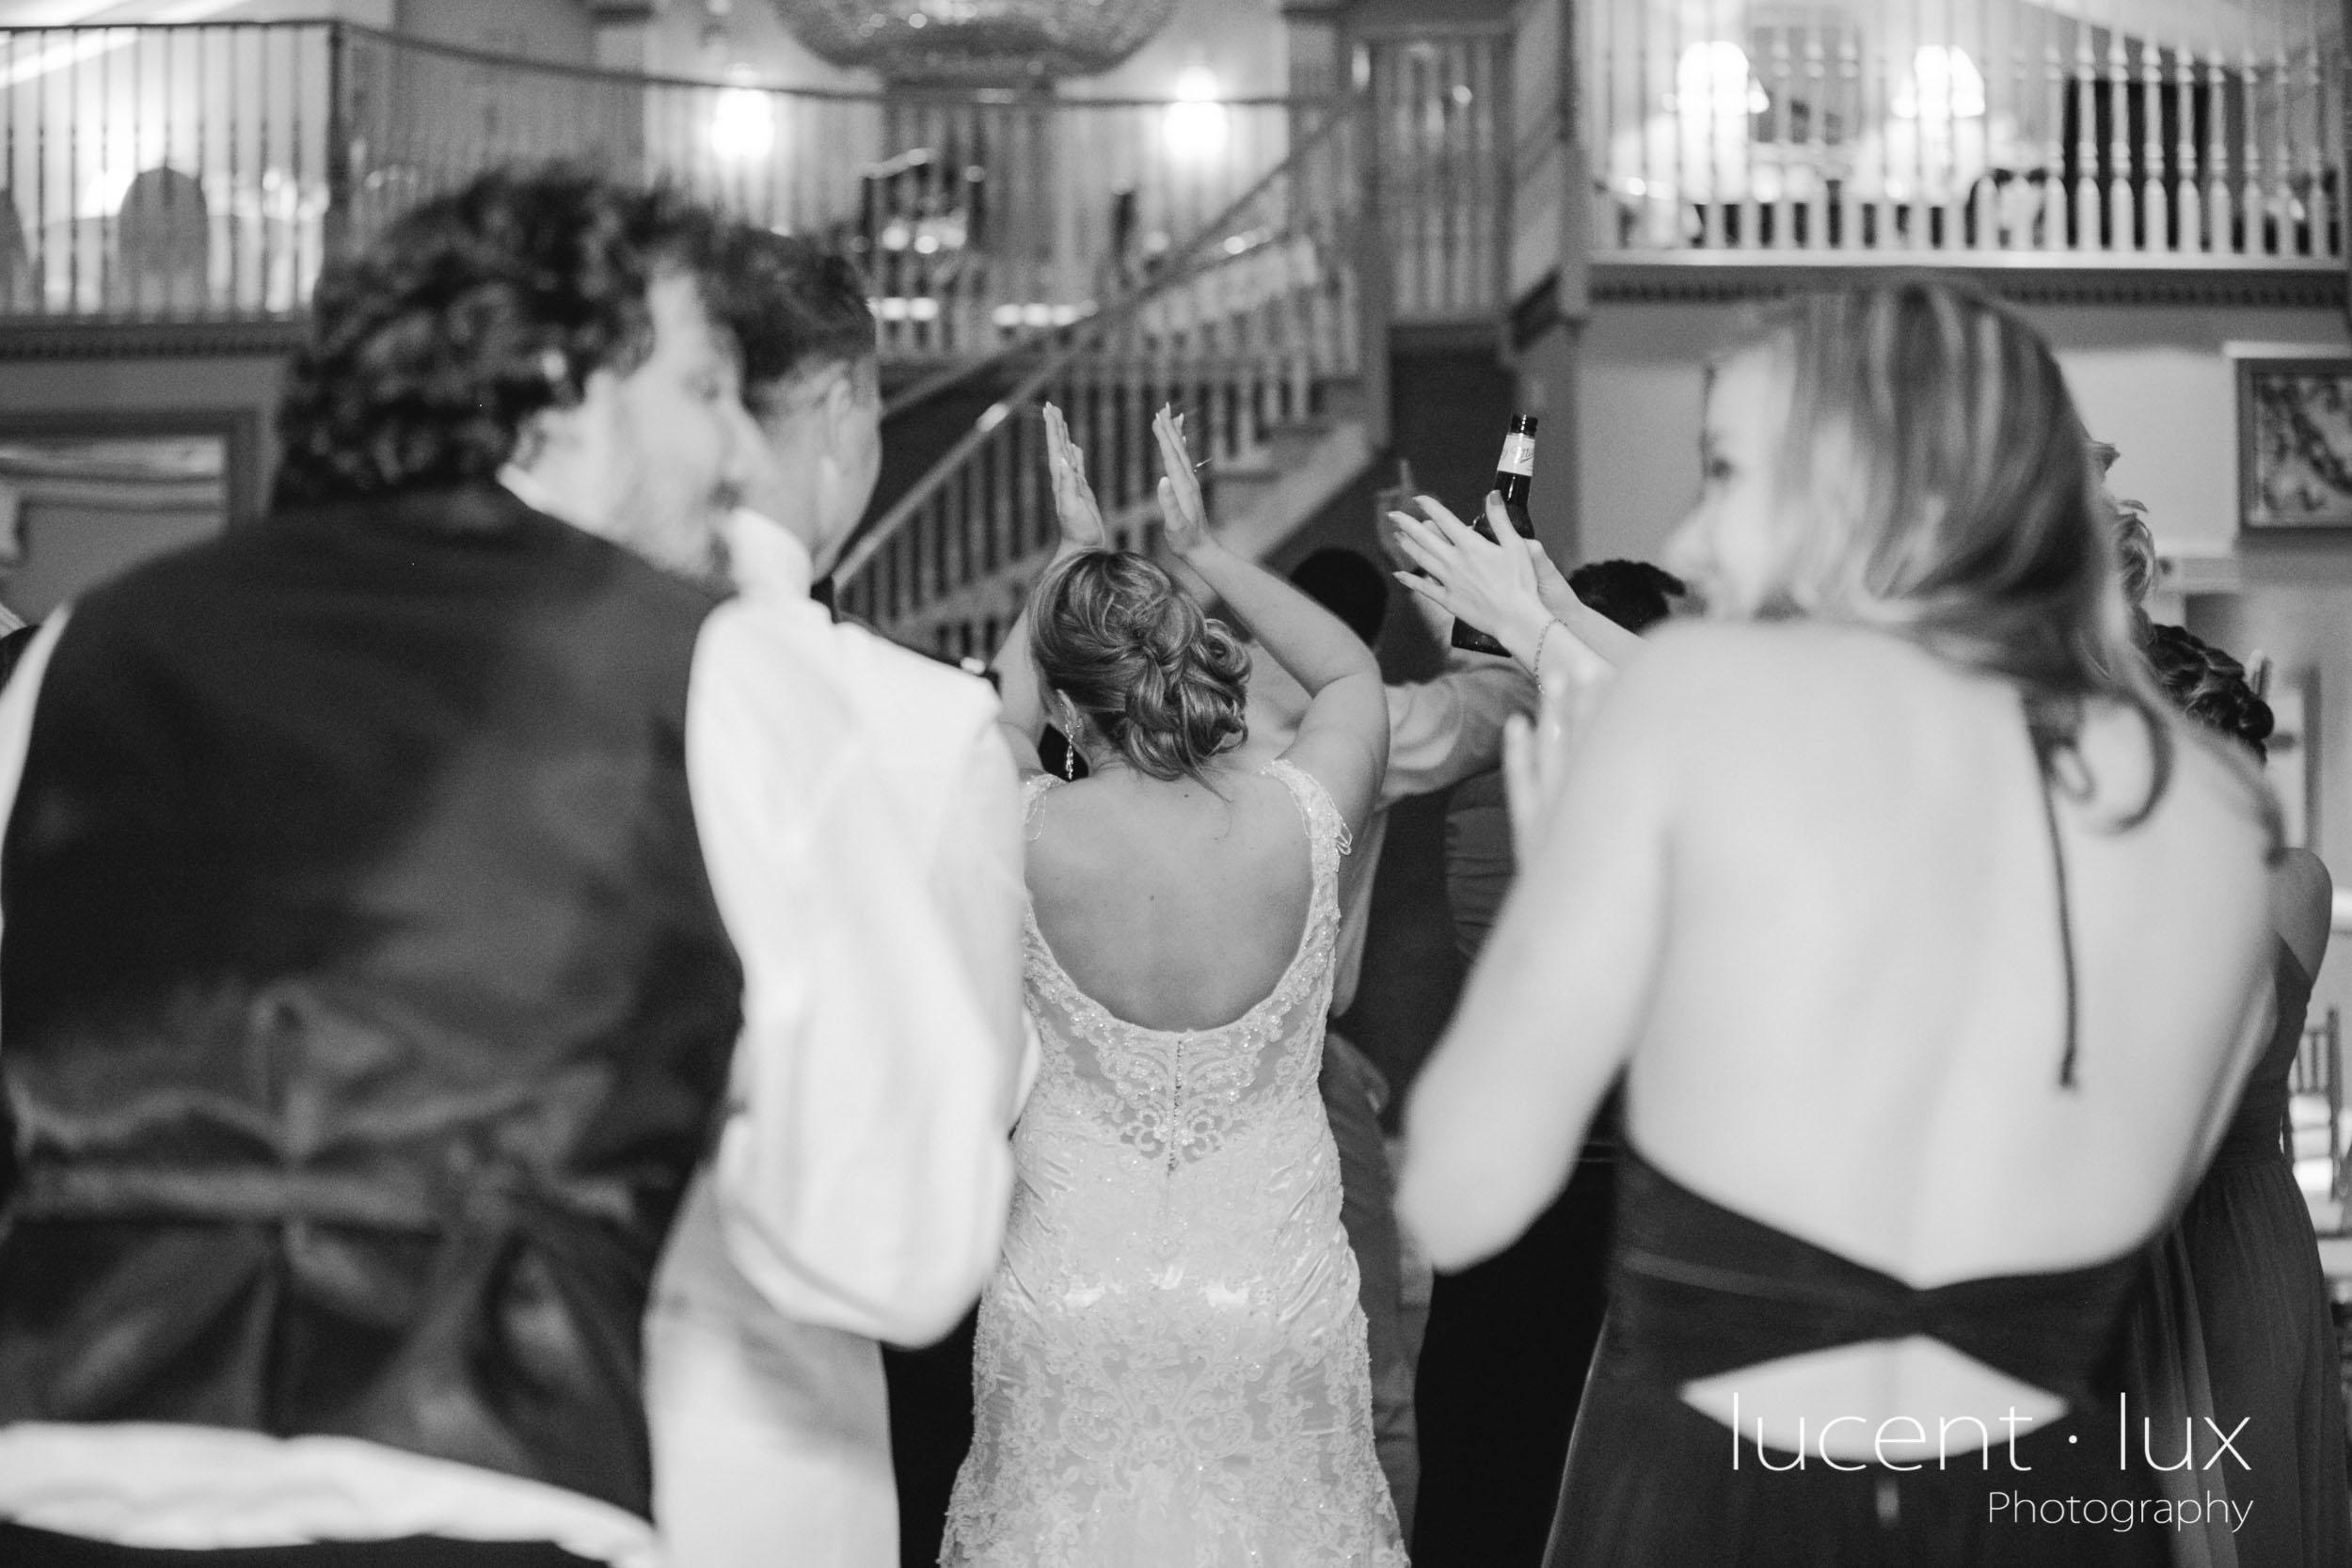 Wedding-Photography-Maryland-Pennsylvania-Photographer-Mendenhall-Inn-Media-Portrait-Event-156.jpg